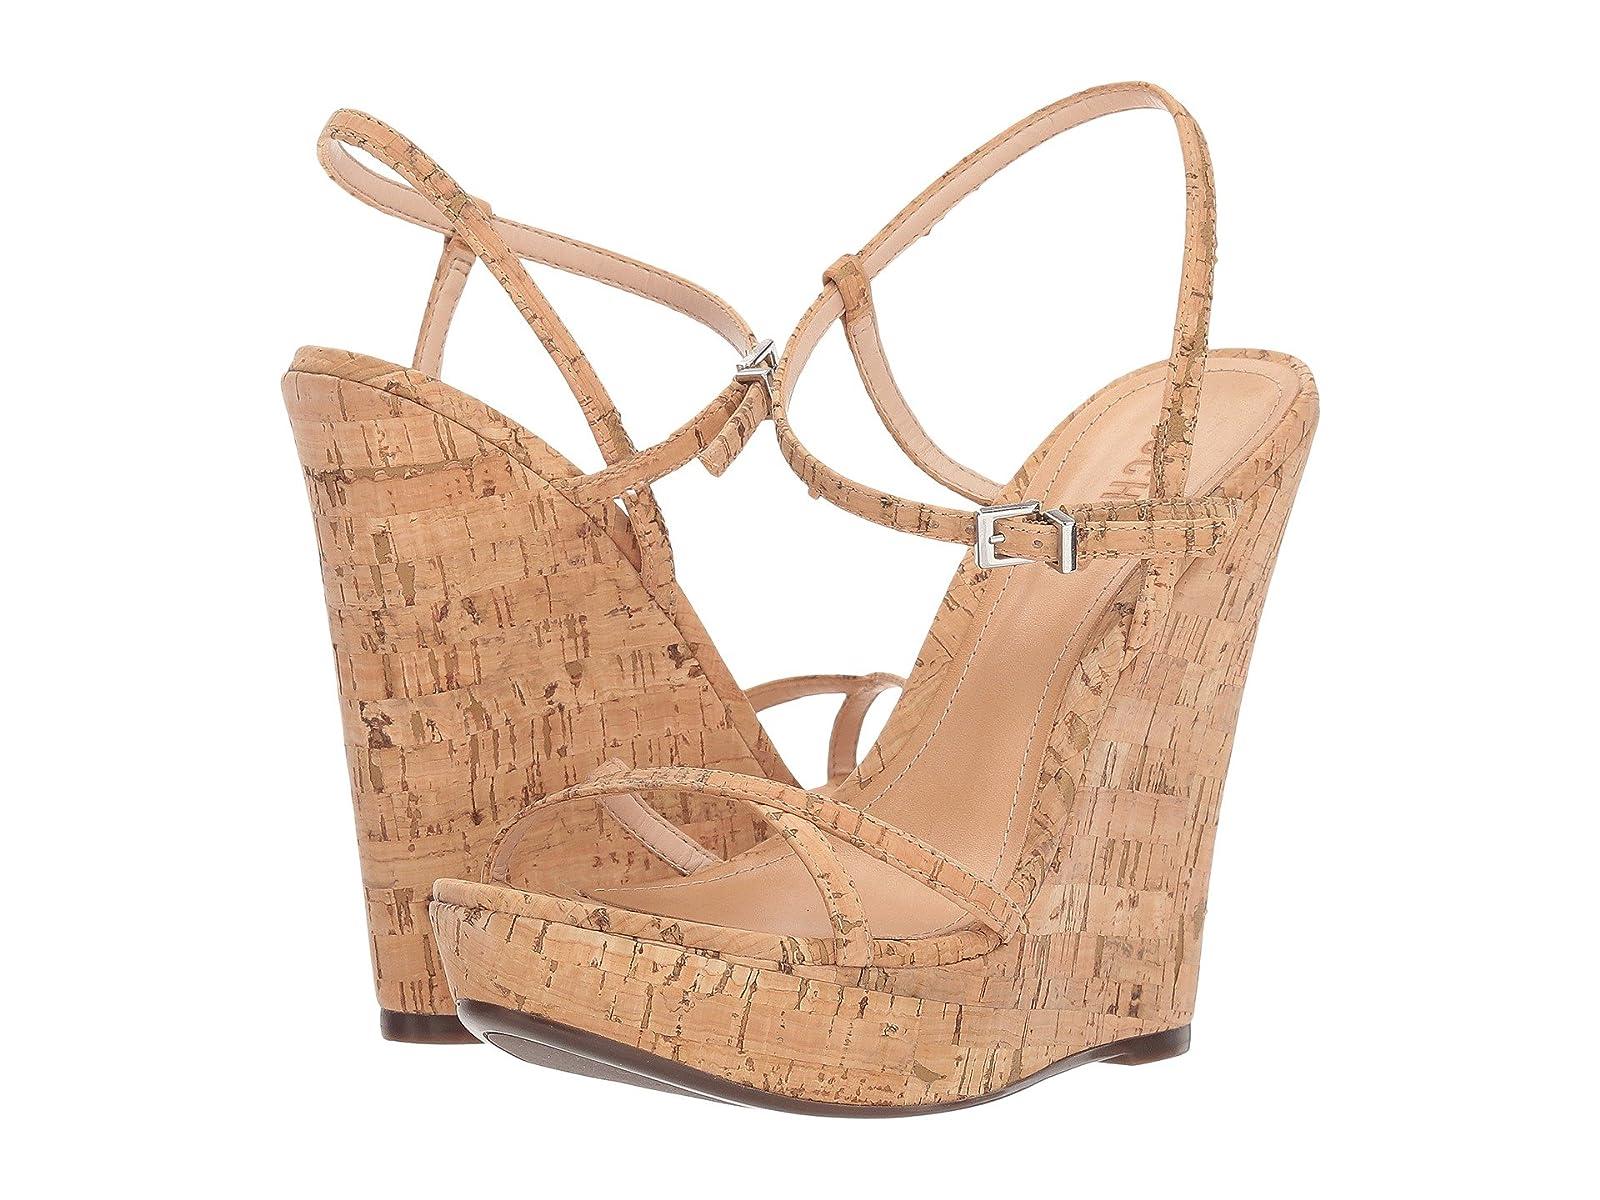 Schutz Auria Wedge SandalAtmospheric grades have affordable shoes